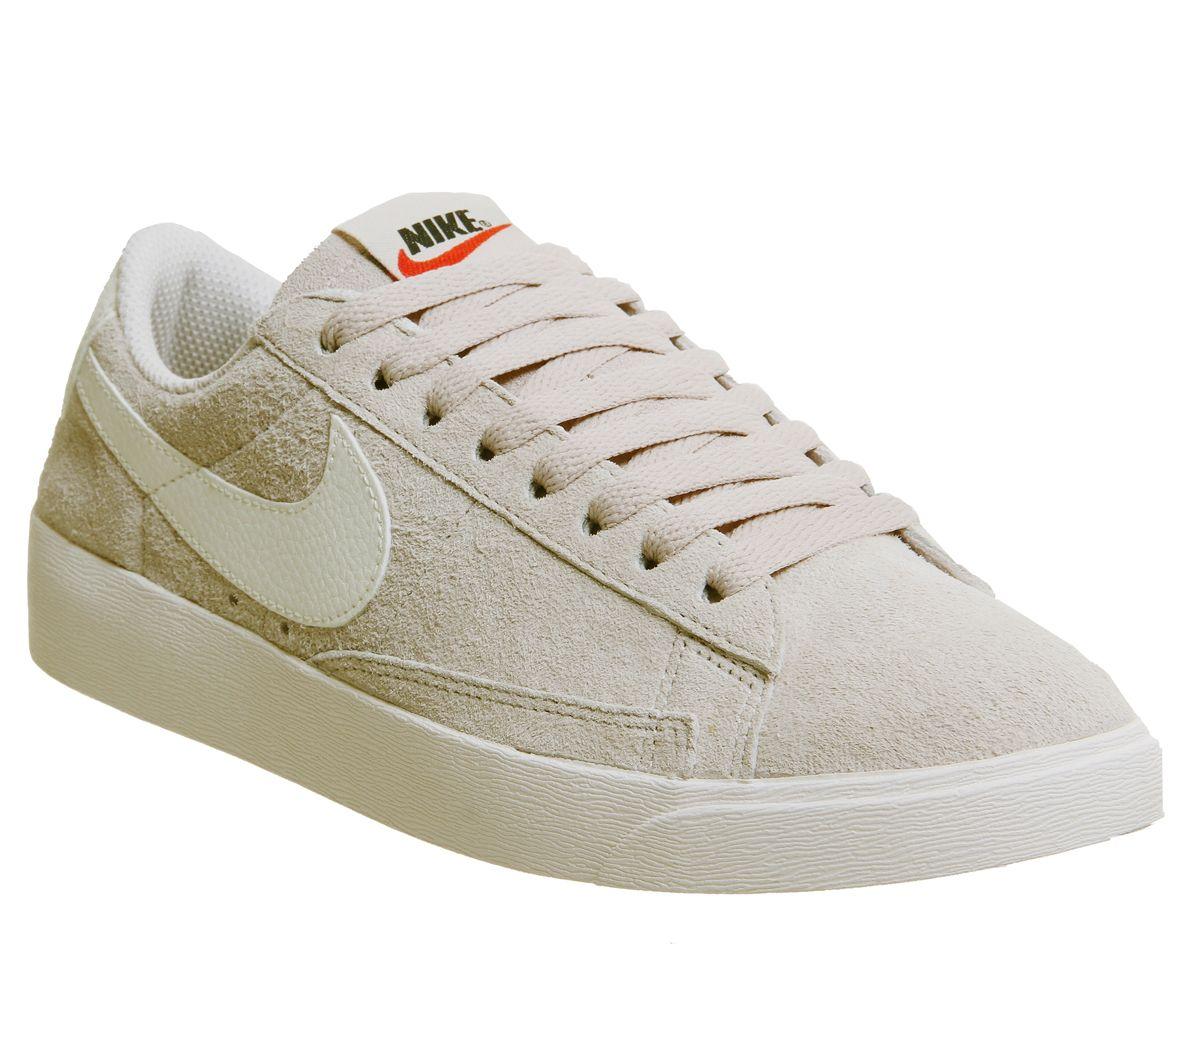 75a8e5efaf1a Nike Blazer Low Trainers Desert Sand Sail F - Hers trainers